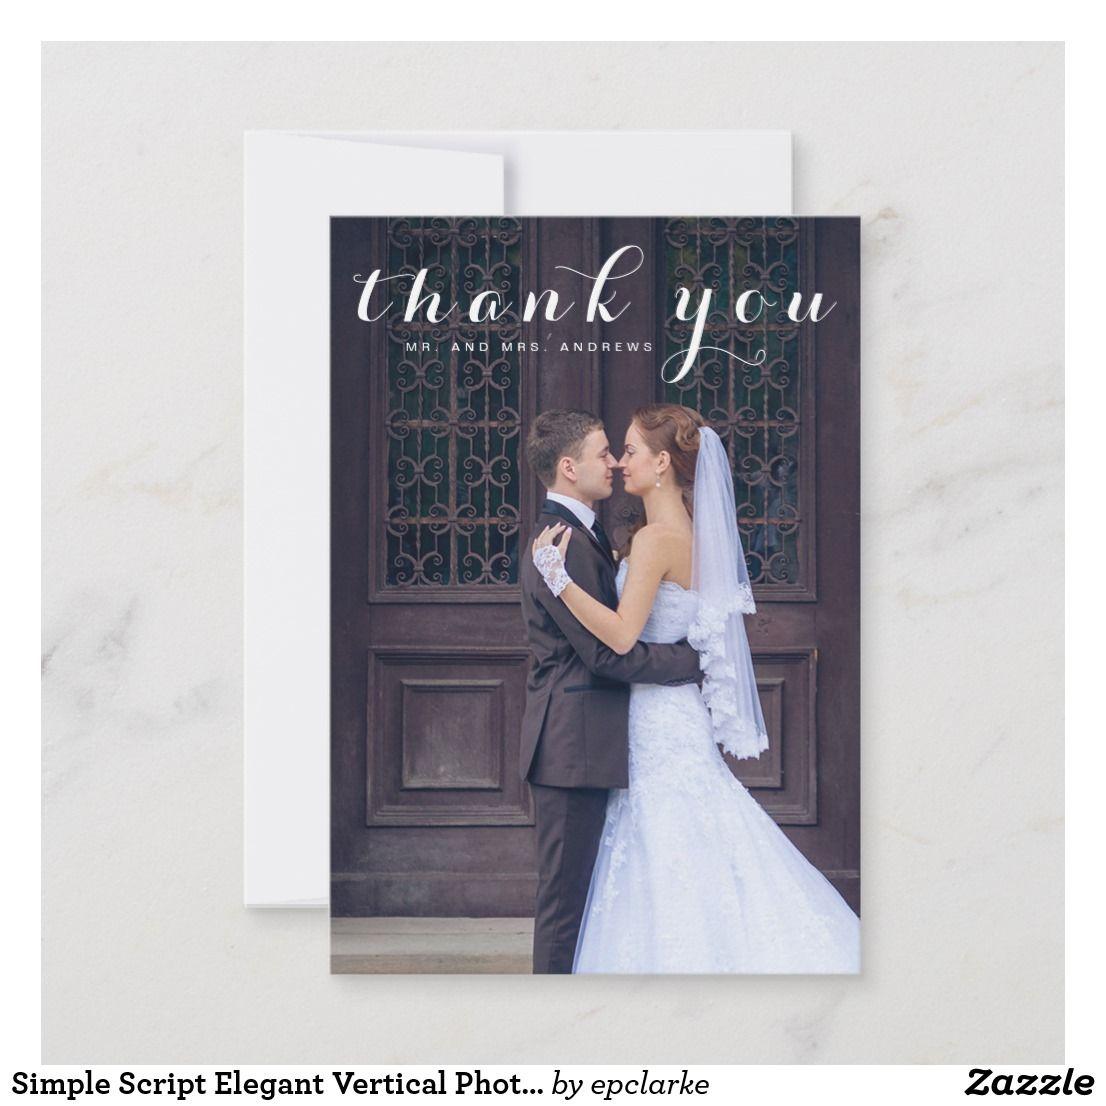 simple script elegant vertical photo wedding thank you